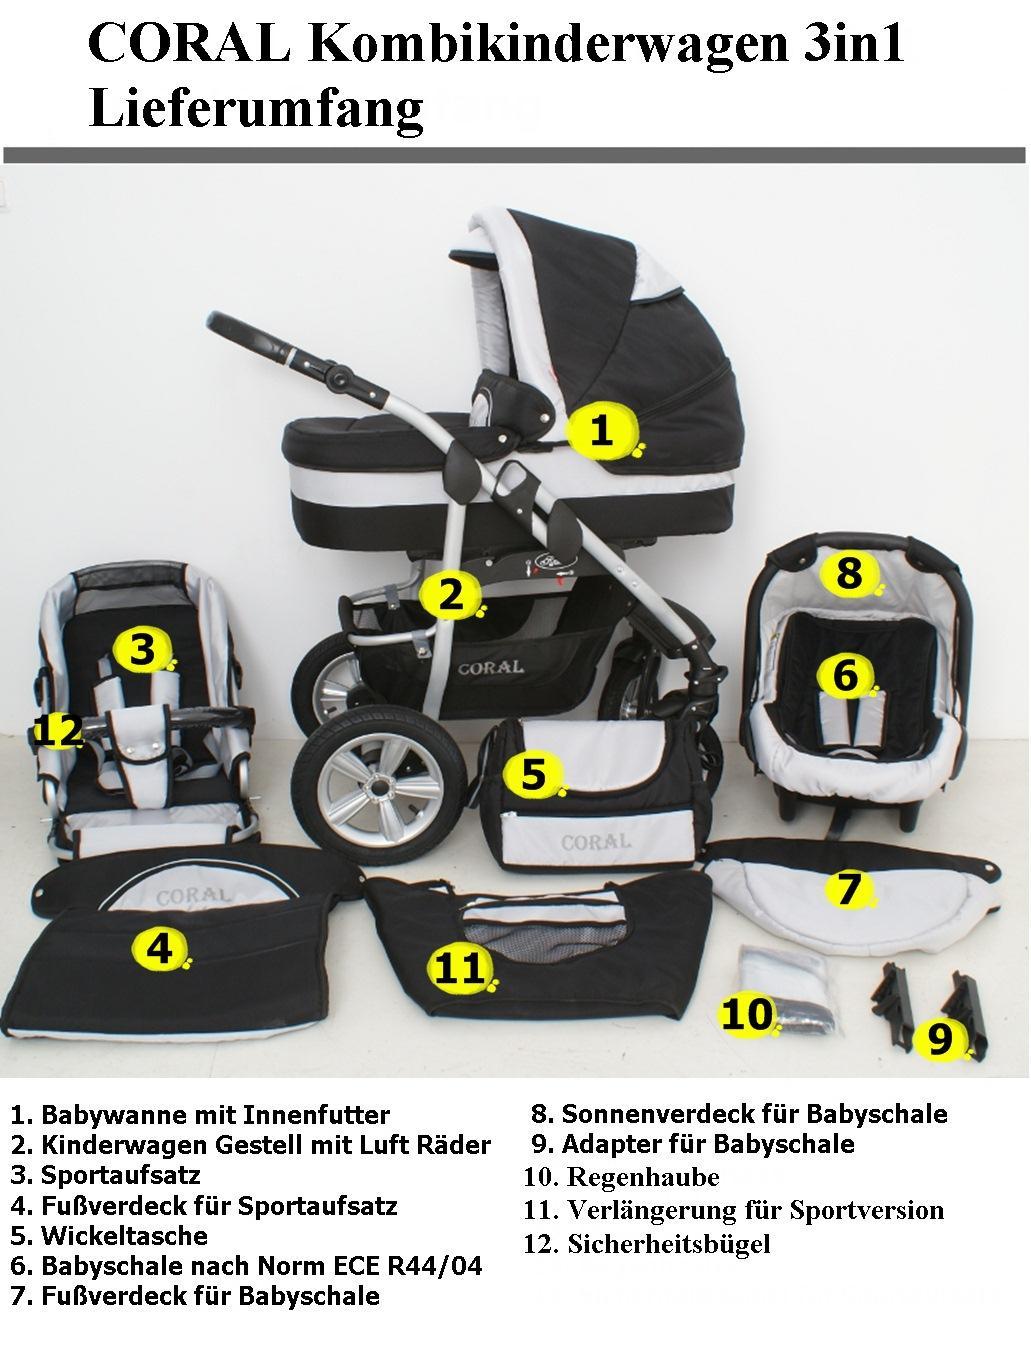 coral kombikinderwagen kinderwagen set babyschale. Black Bedroom Furniture Sets. Home Design Ideas